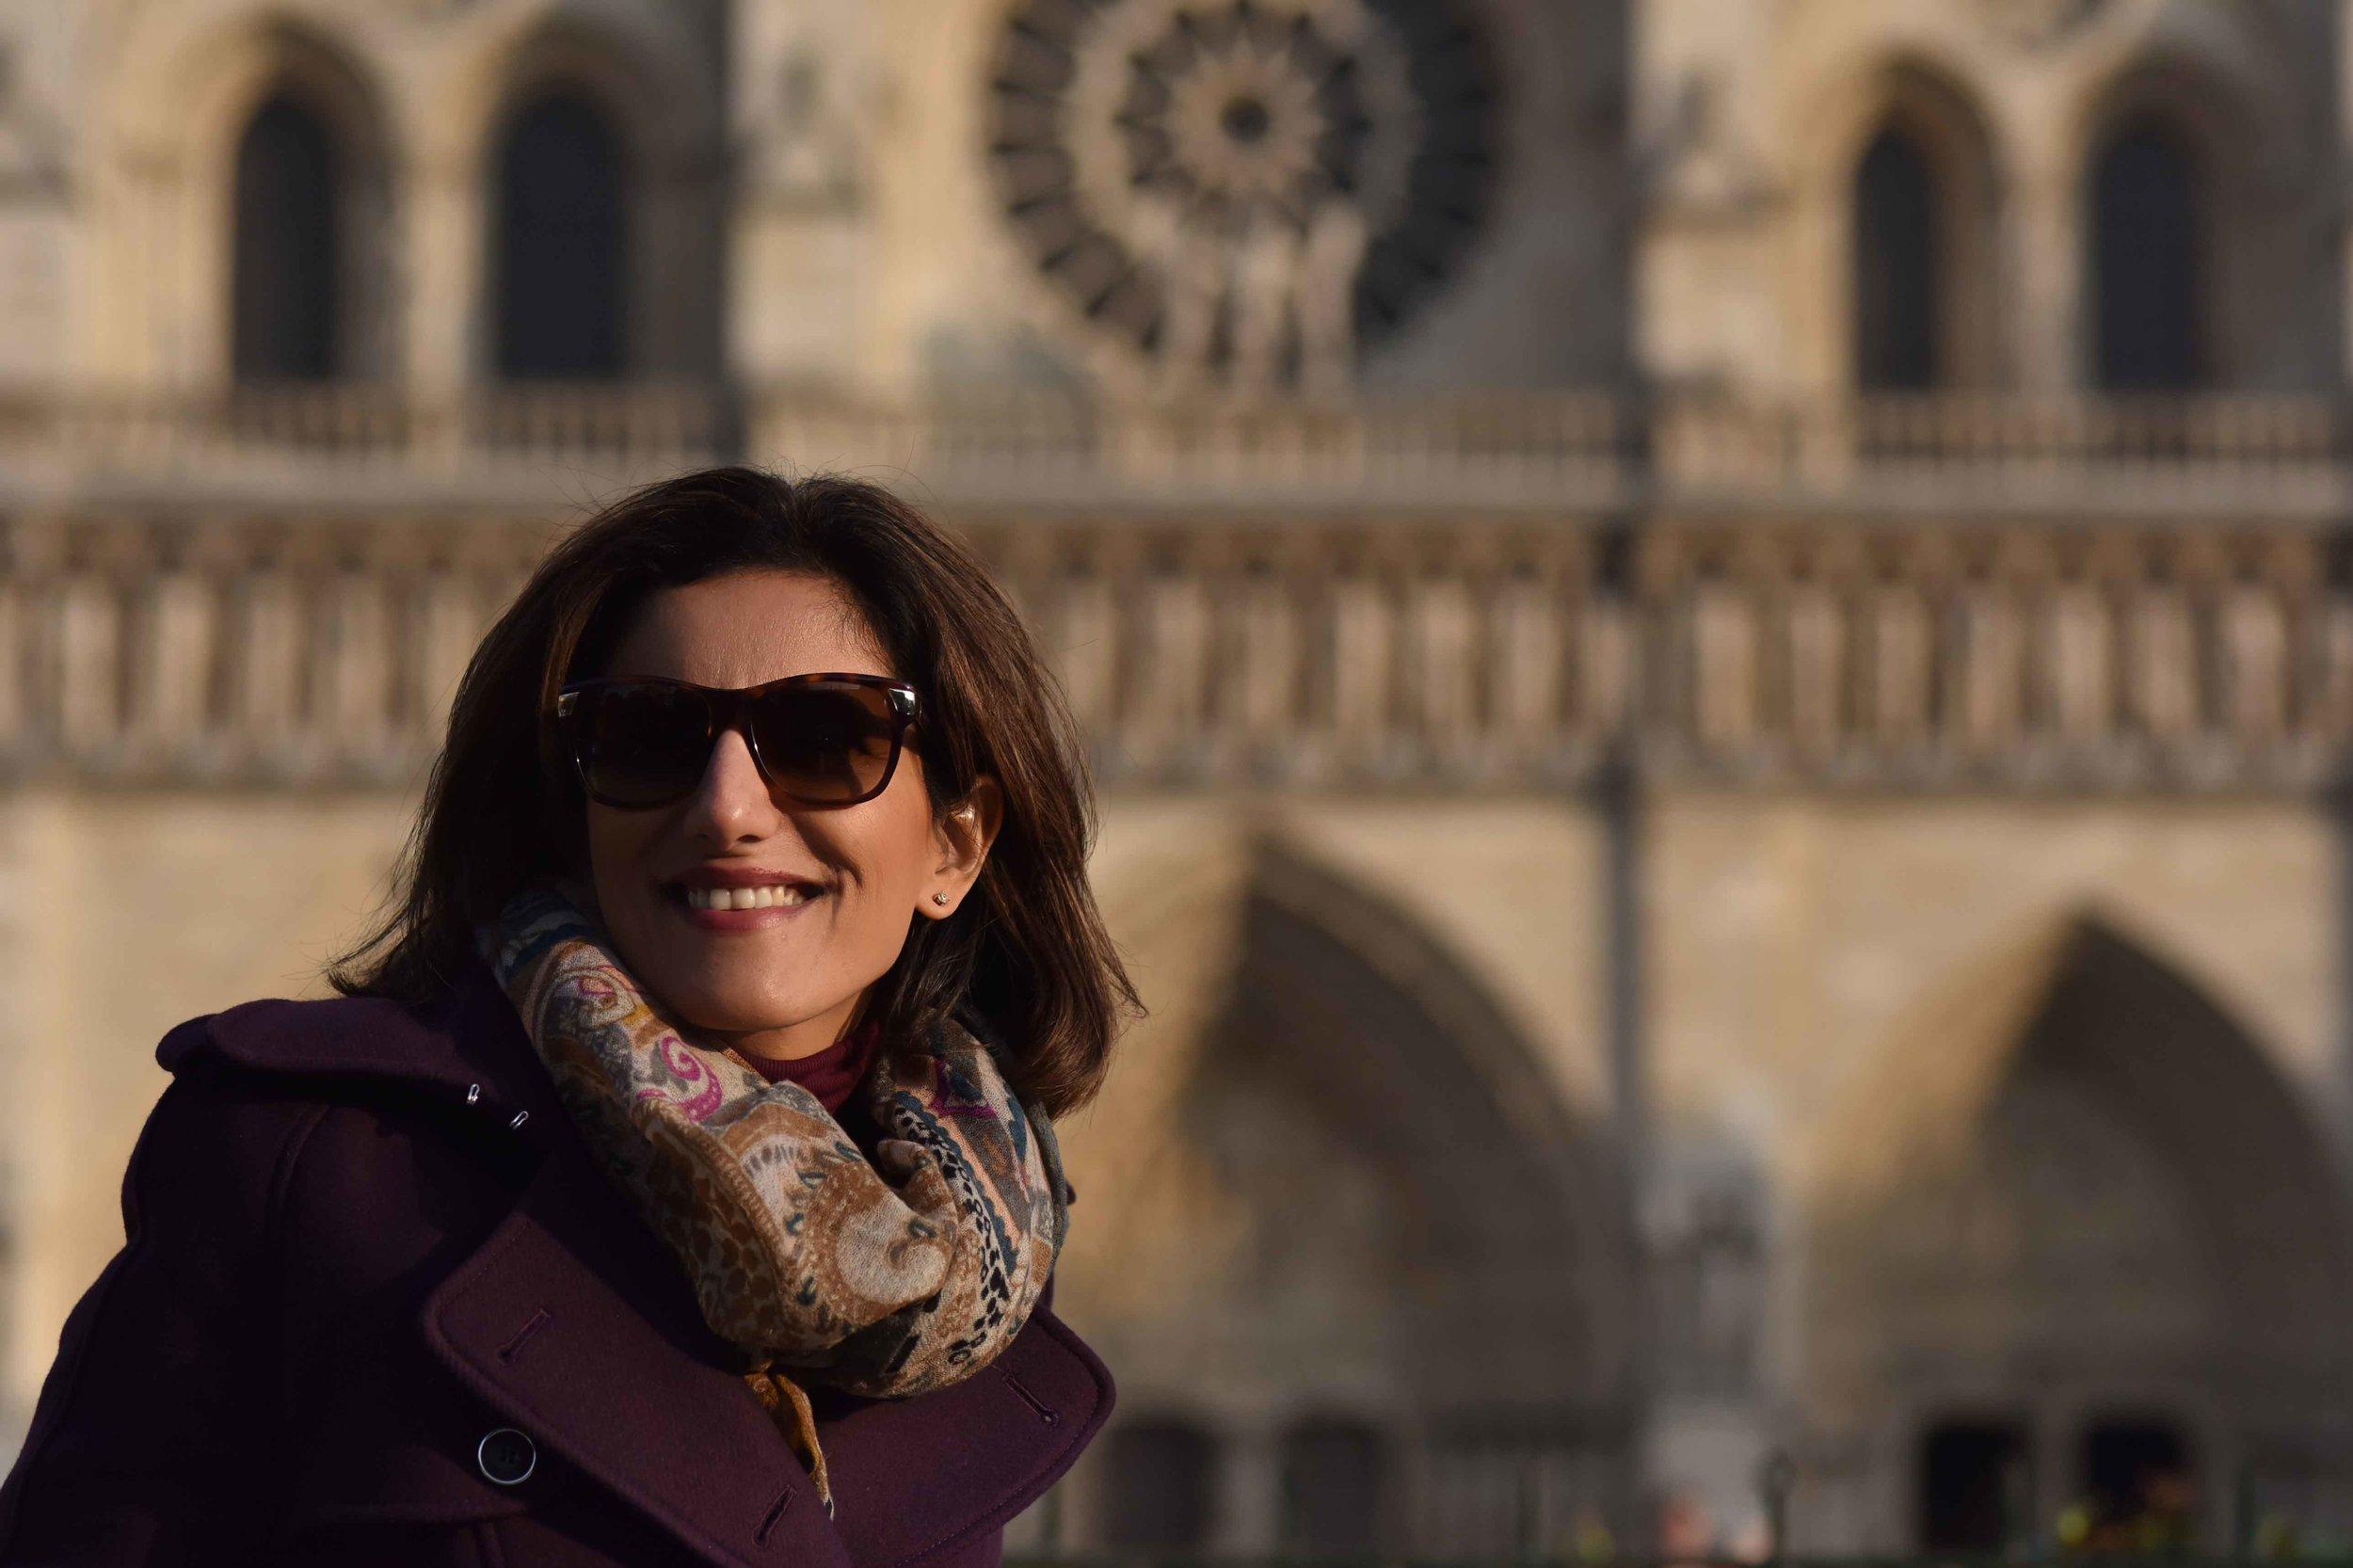 Karen Millen fall winter coat, Hallhuber scarf, Guccci sunglasses, Notre-Dame, Paris. Image©sourcingstyle.com